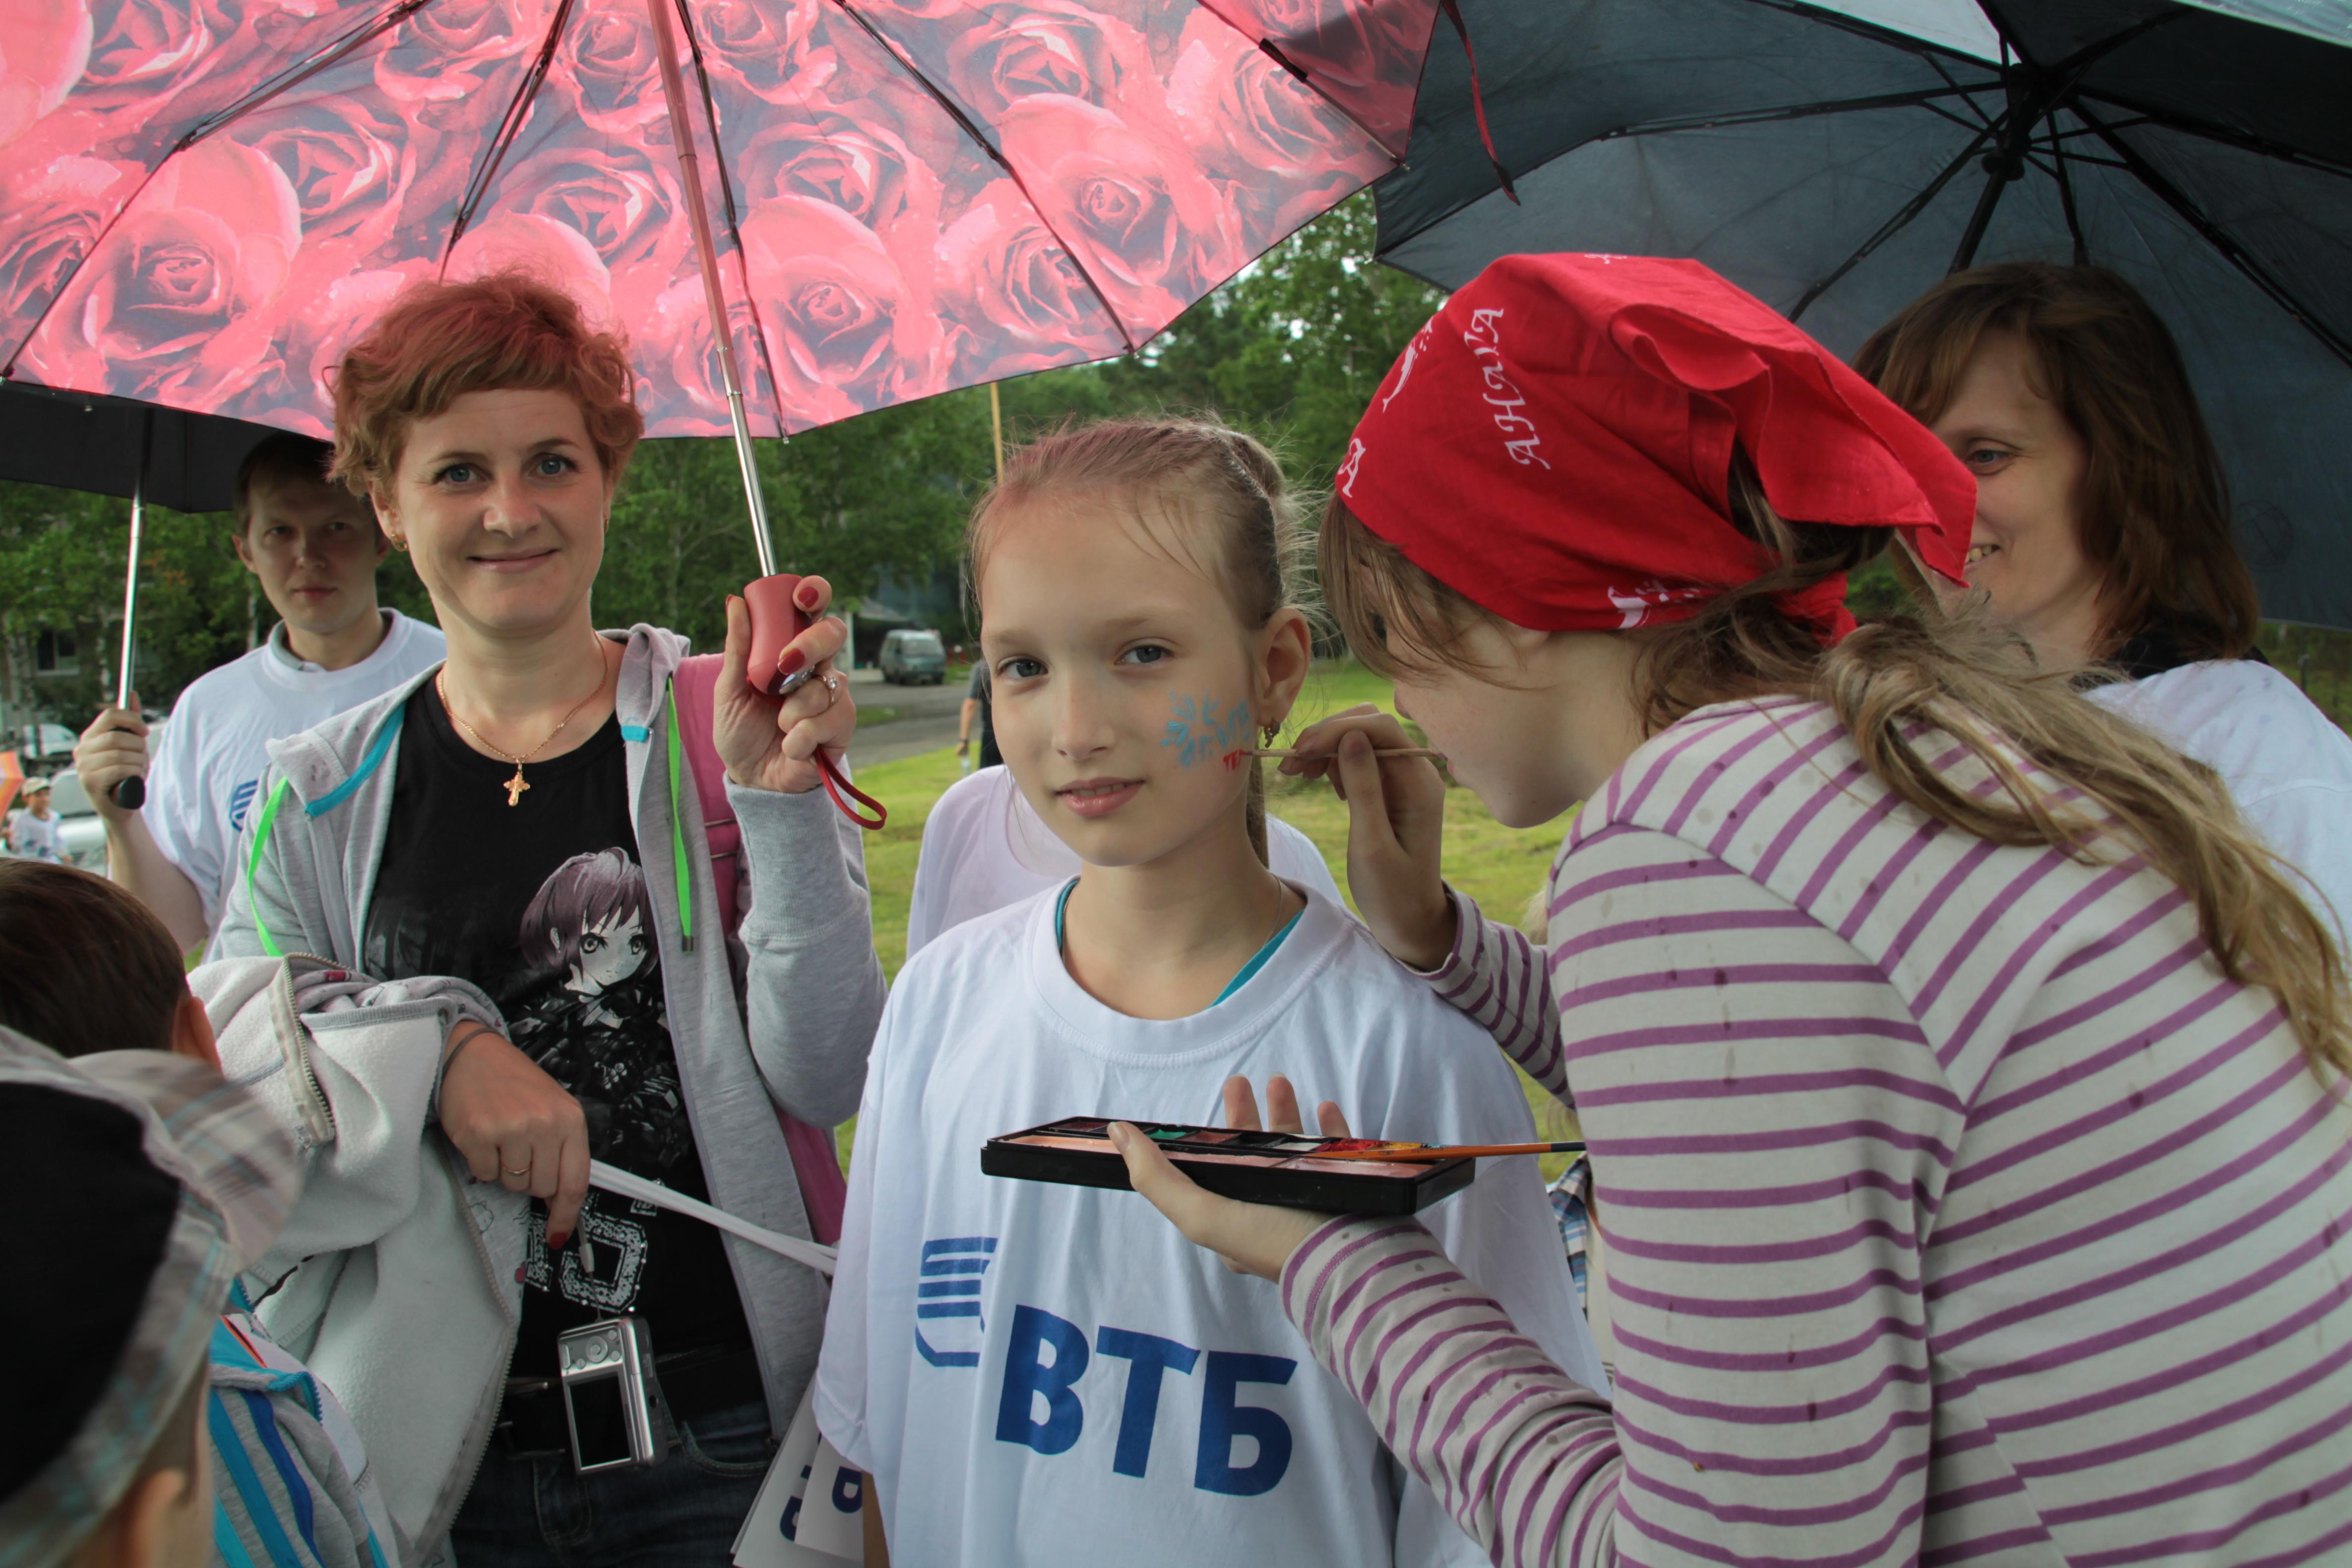 Красками Насте рисуют логотип VTB Team - круто.